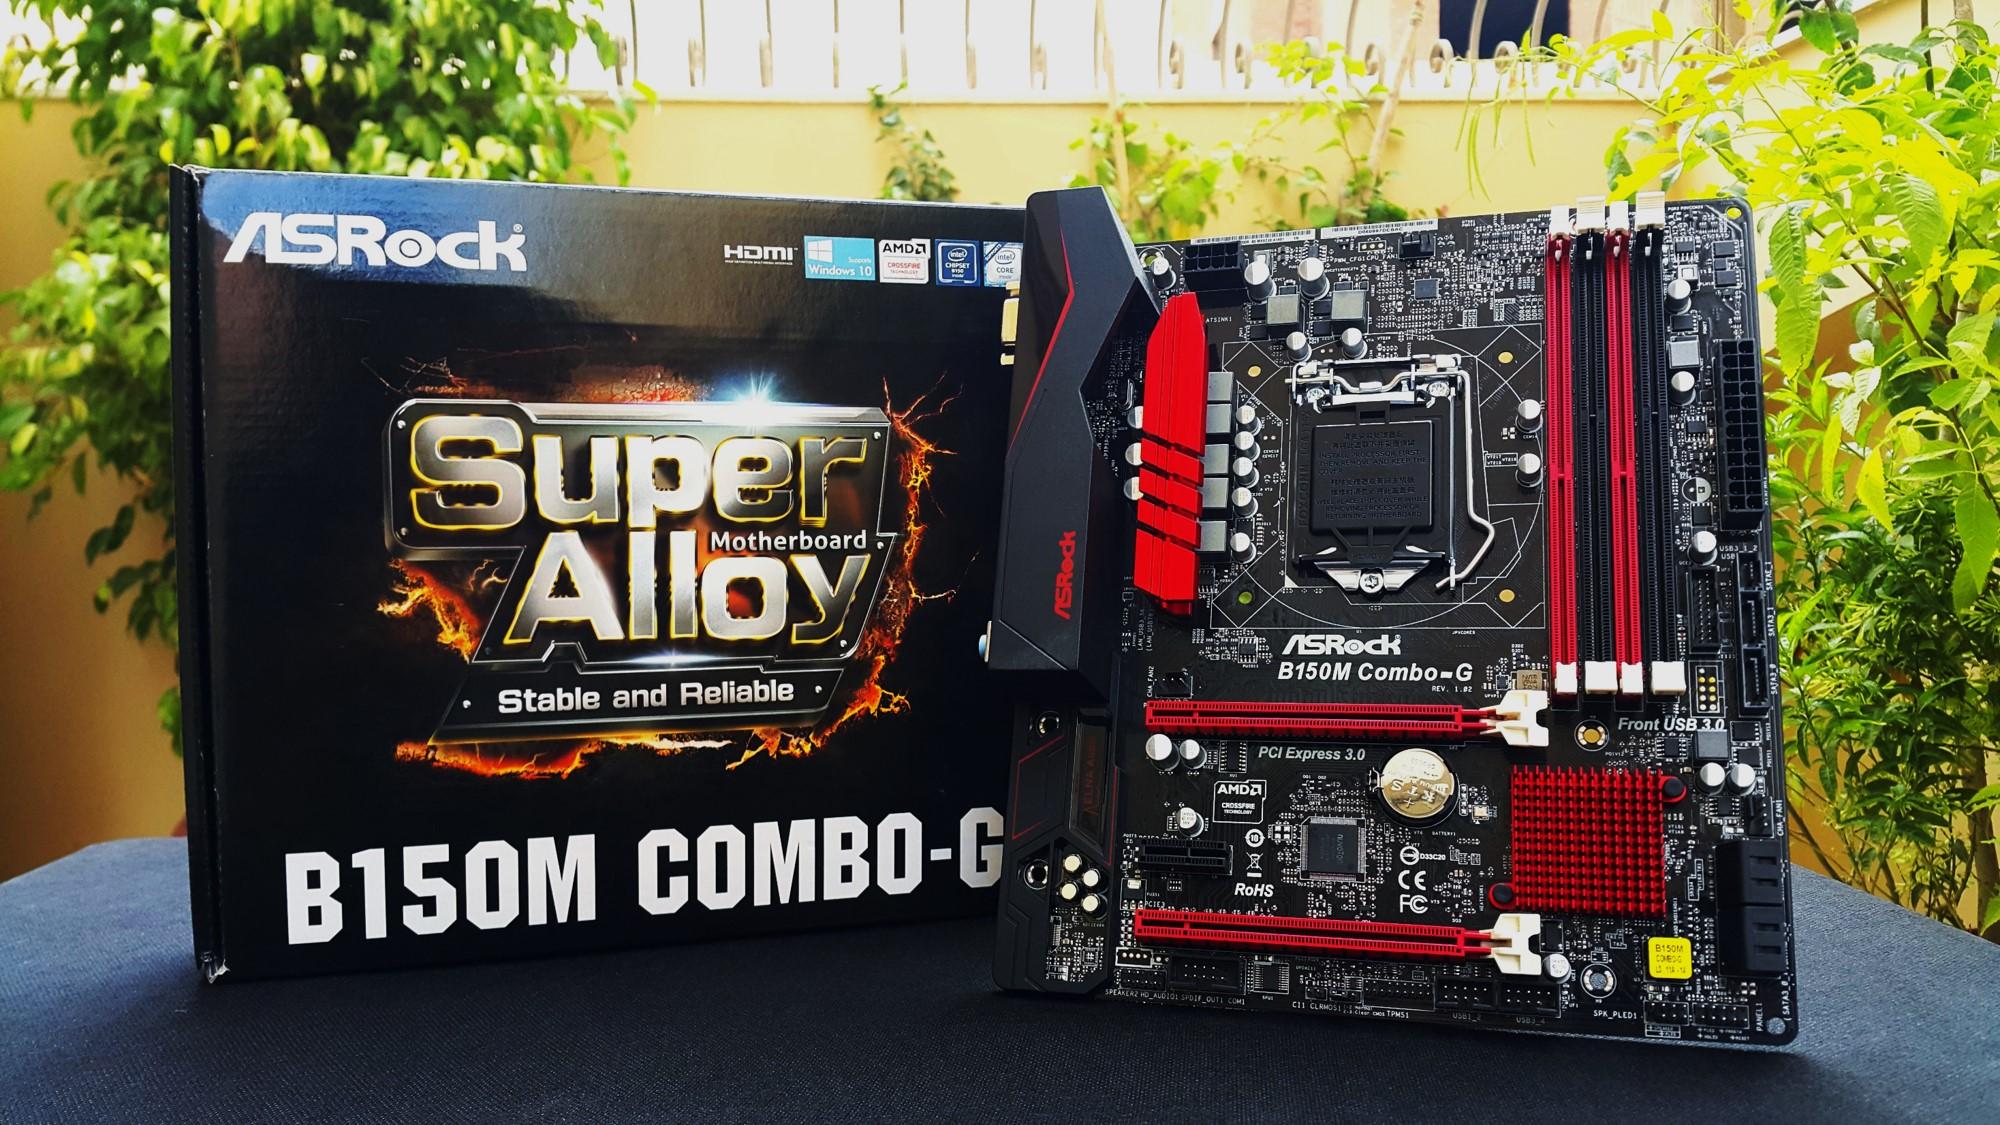 Asrock B150M Combo G Box + Motherboard